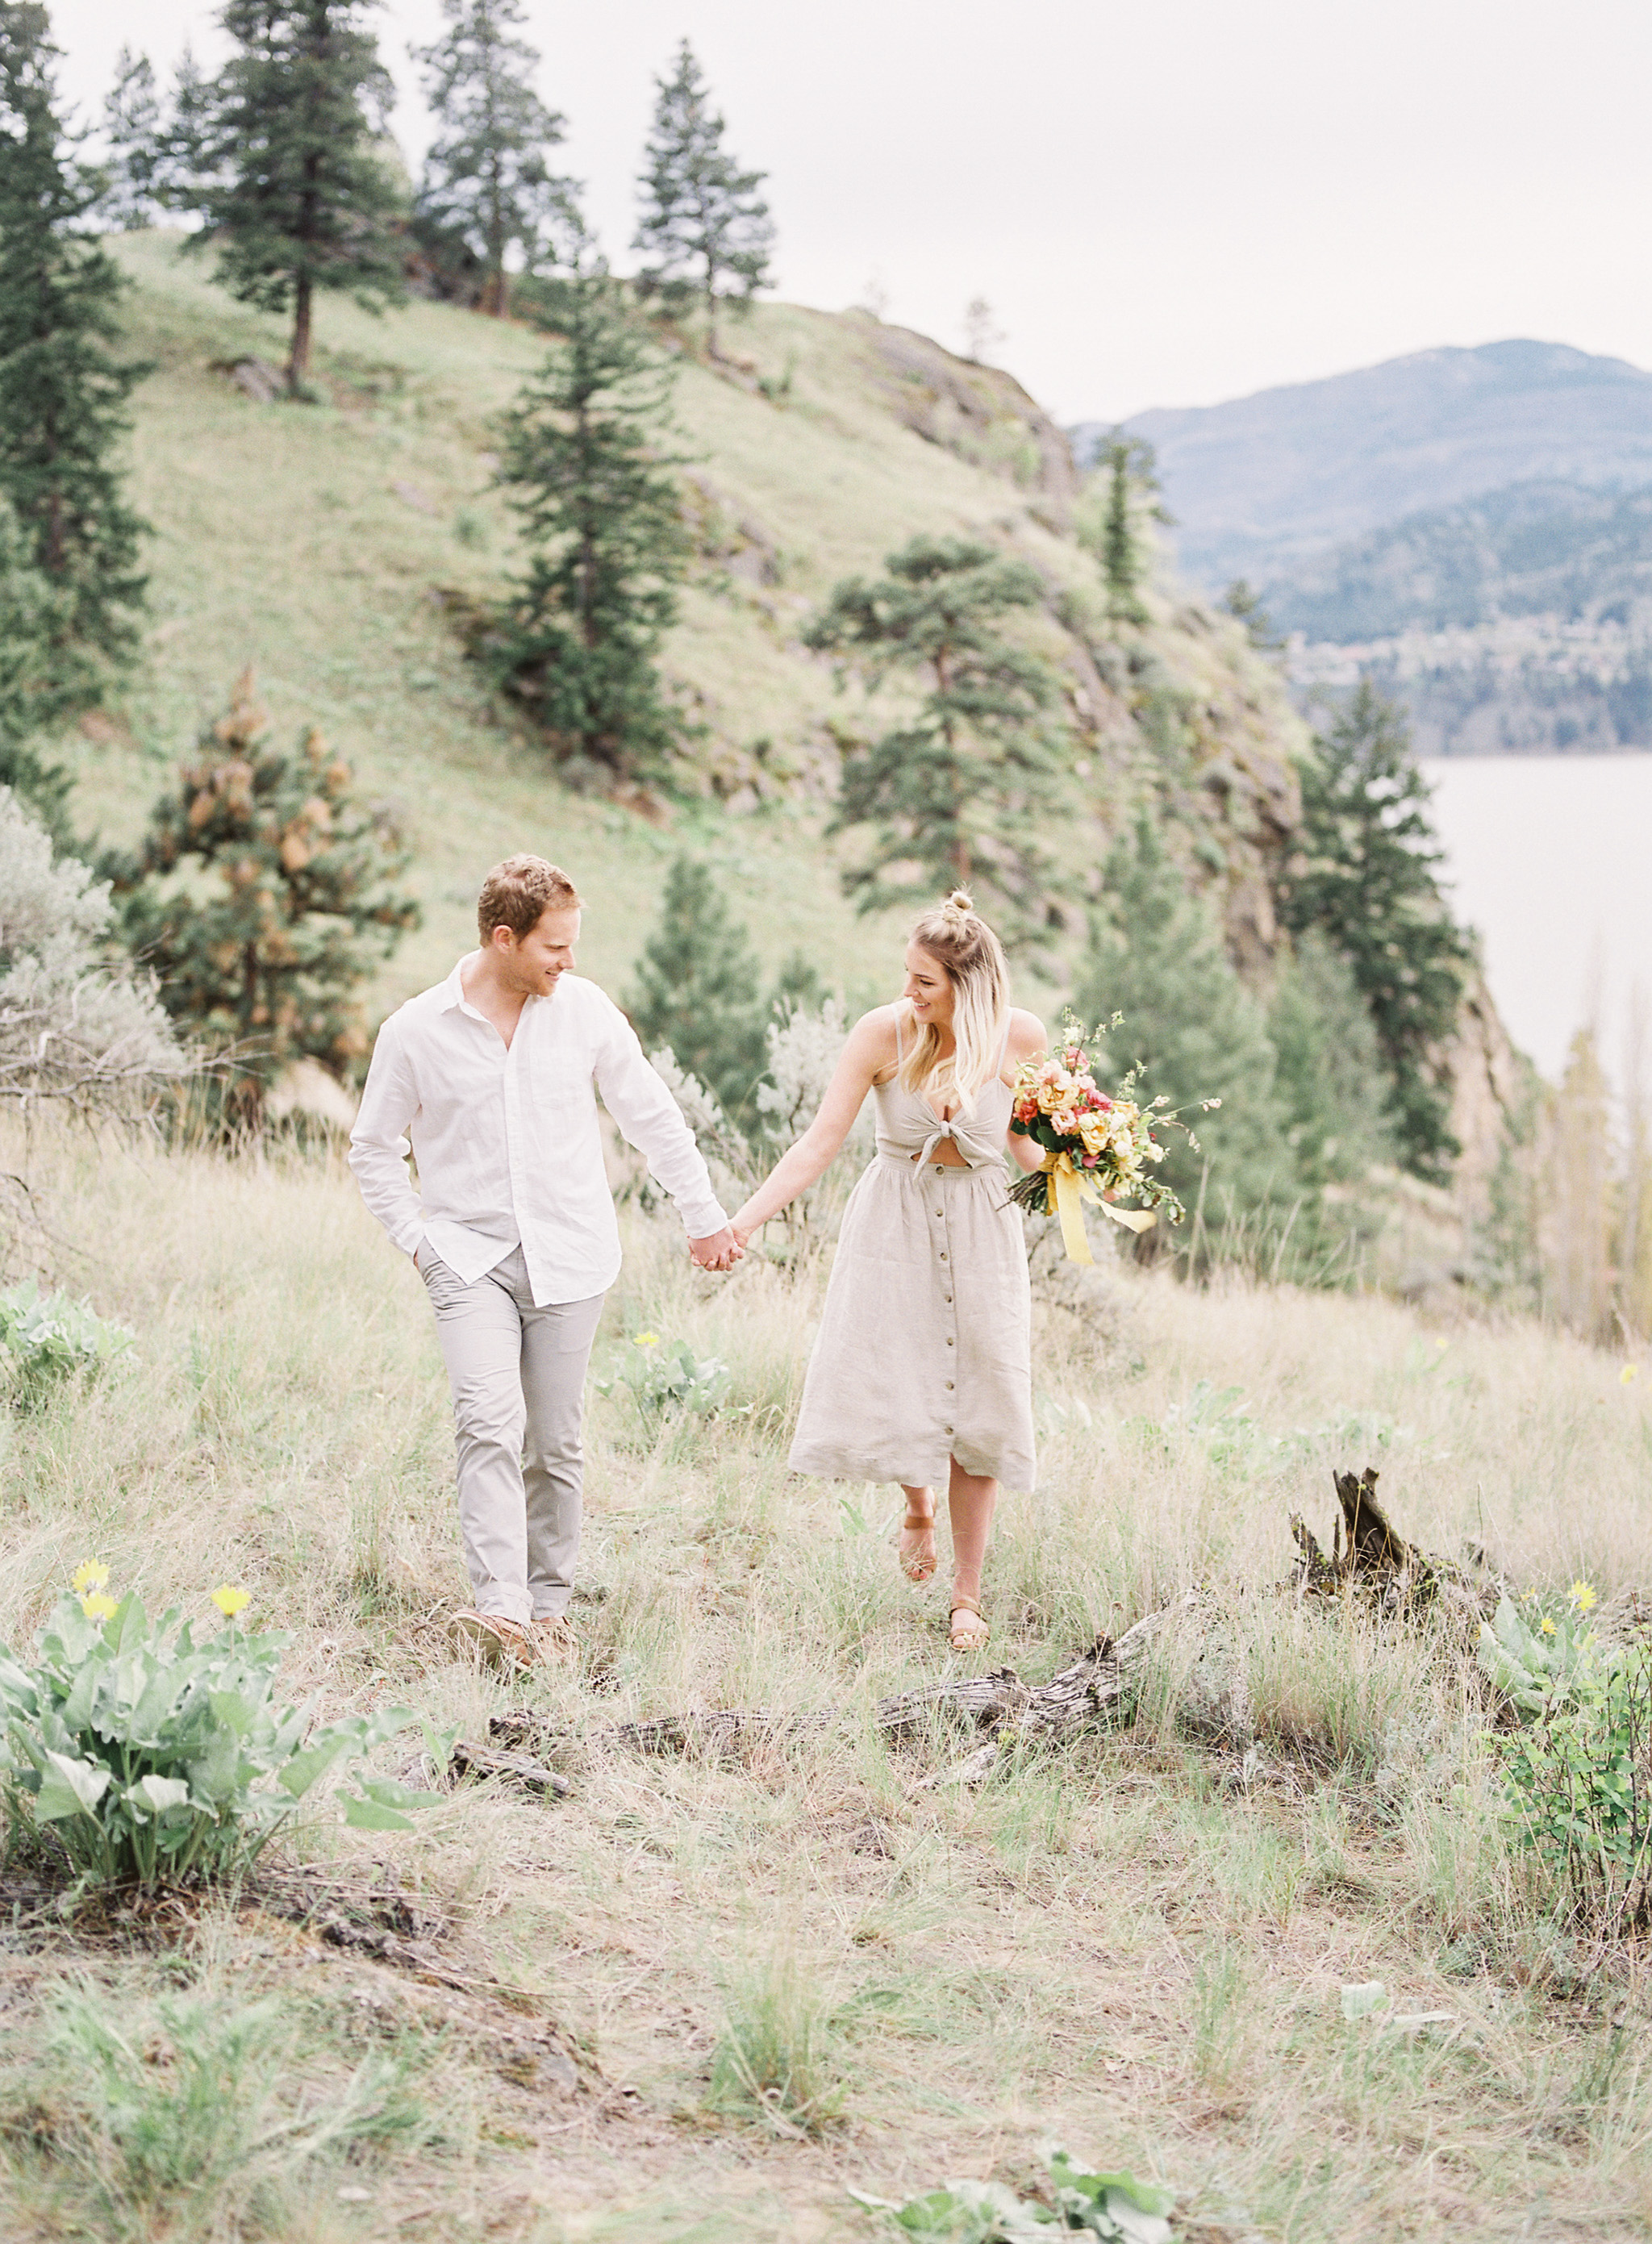 Lisa Catherine Photography - Joy Wed Listing_3.jpg